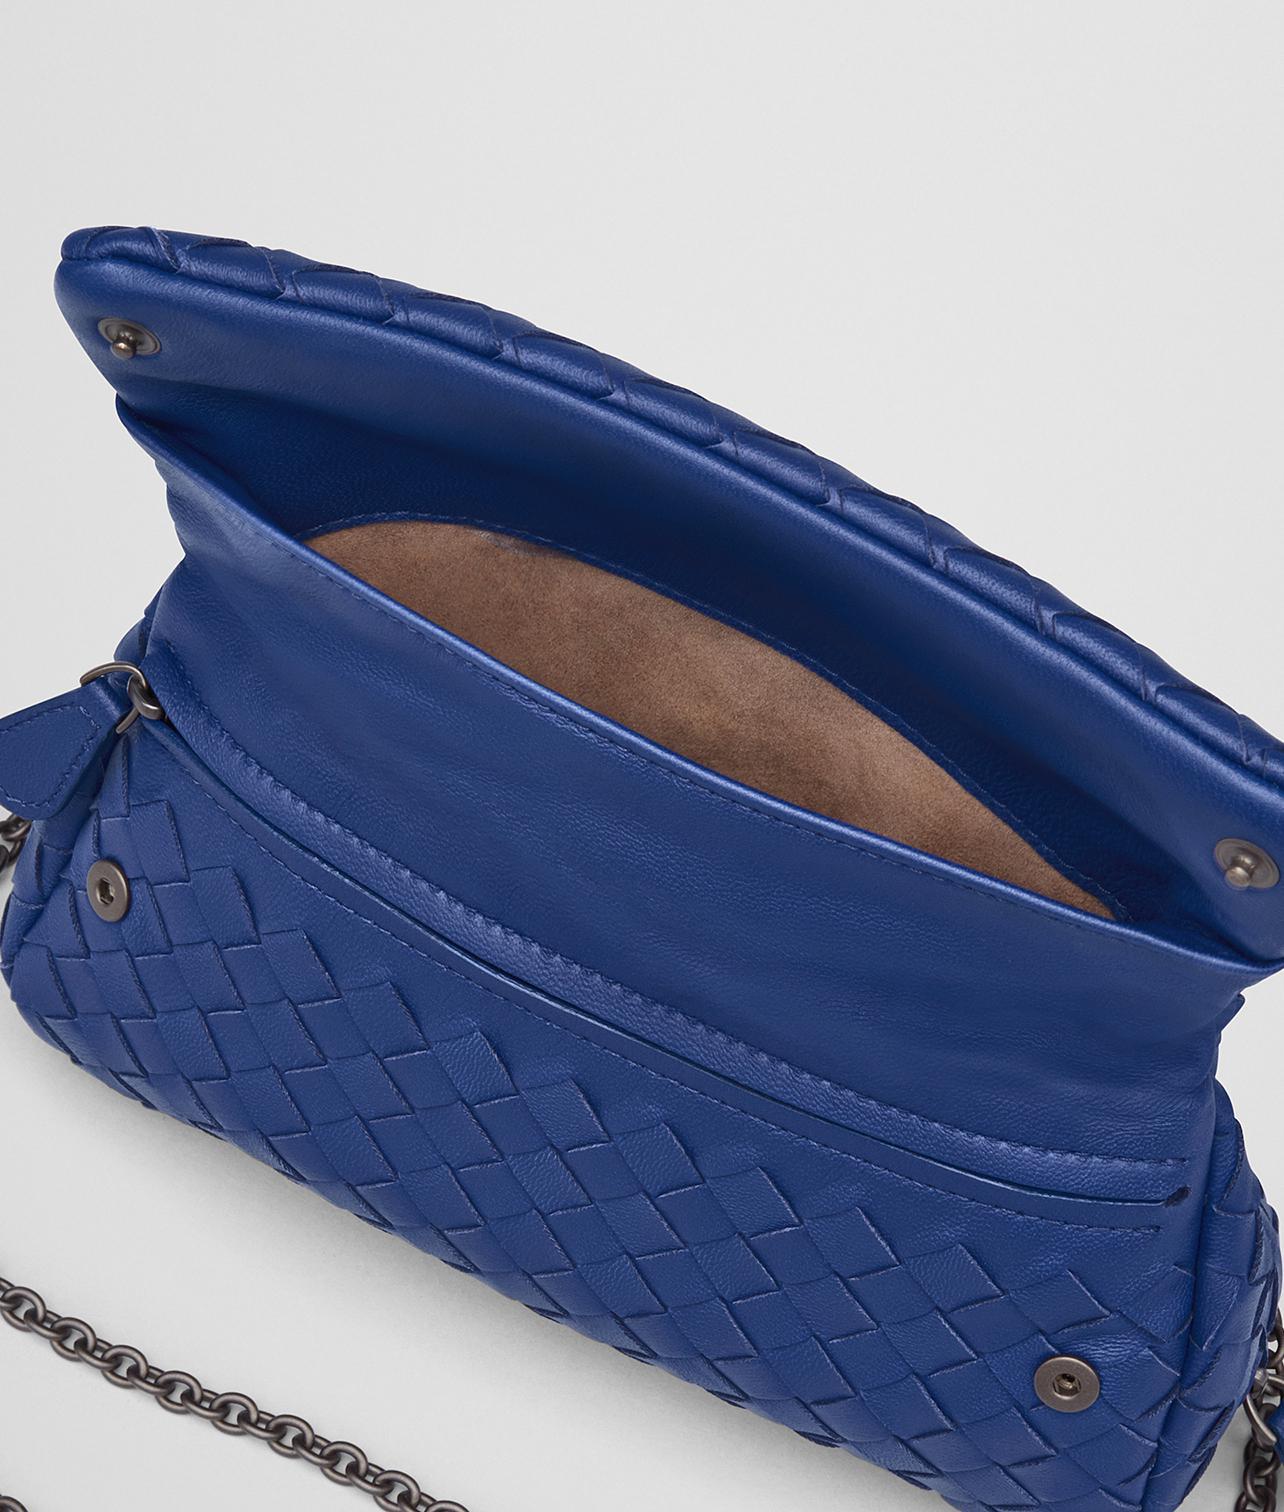 0336cfe827 Lyst - Bottega Veneta Cobalt Intrecciato Nappa Mini Messenger Bag in ...